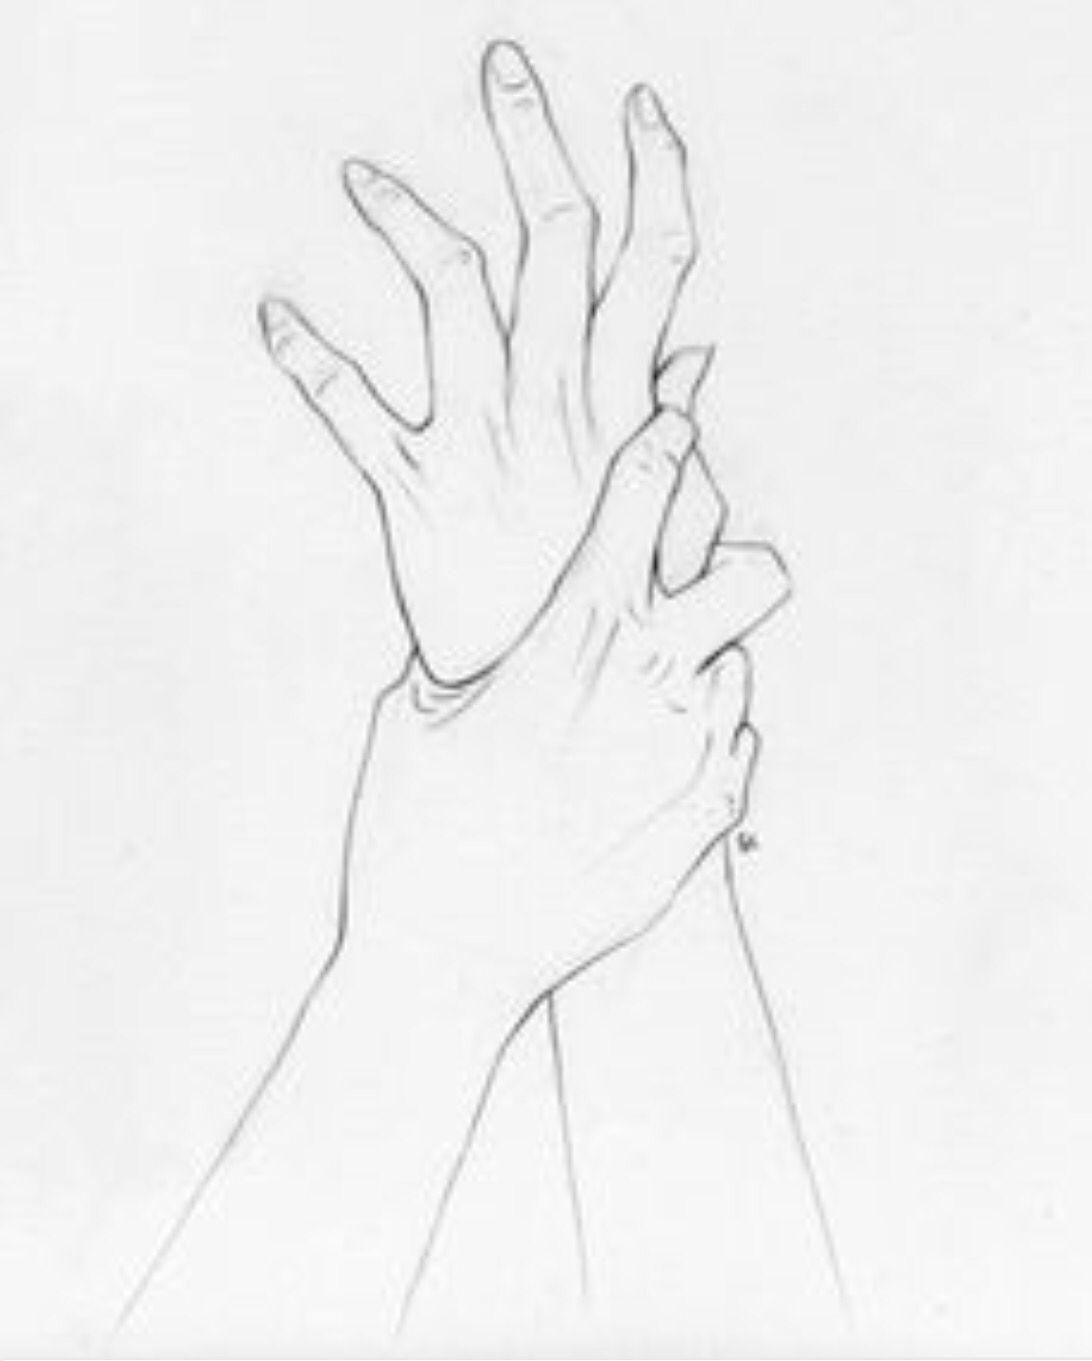 Hand References for Drawing | grabbing wrists | Sketches ...Grabbing Hand Drawing